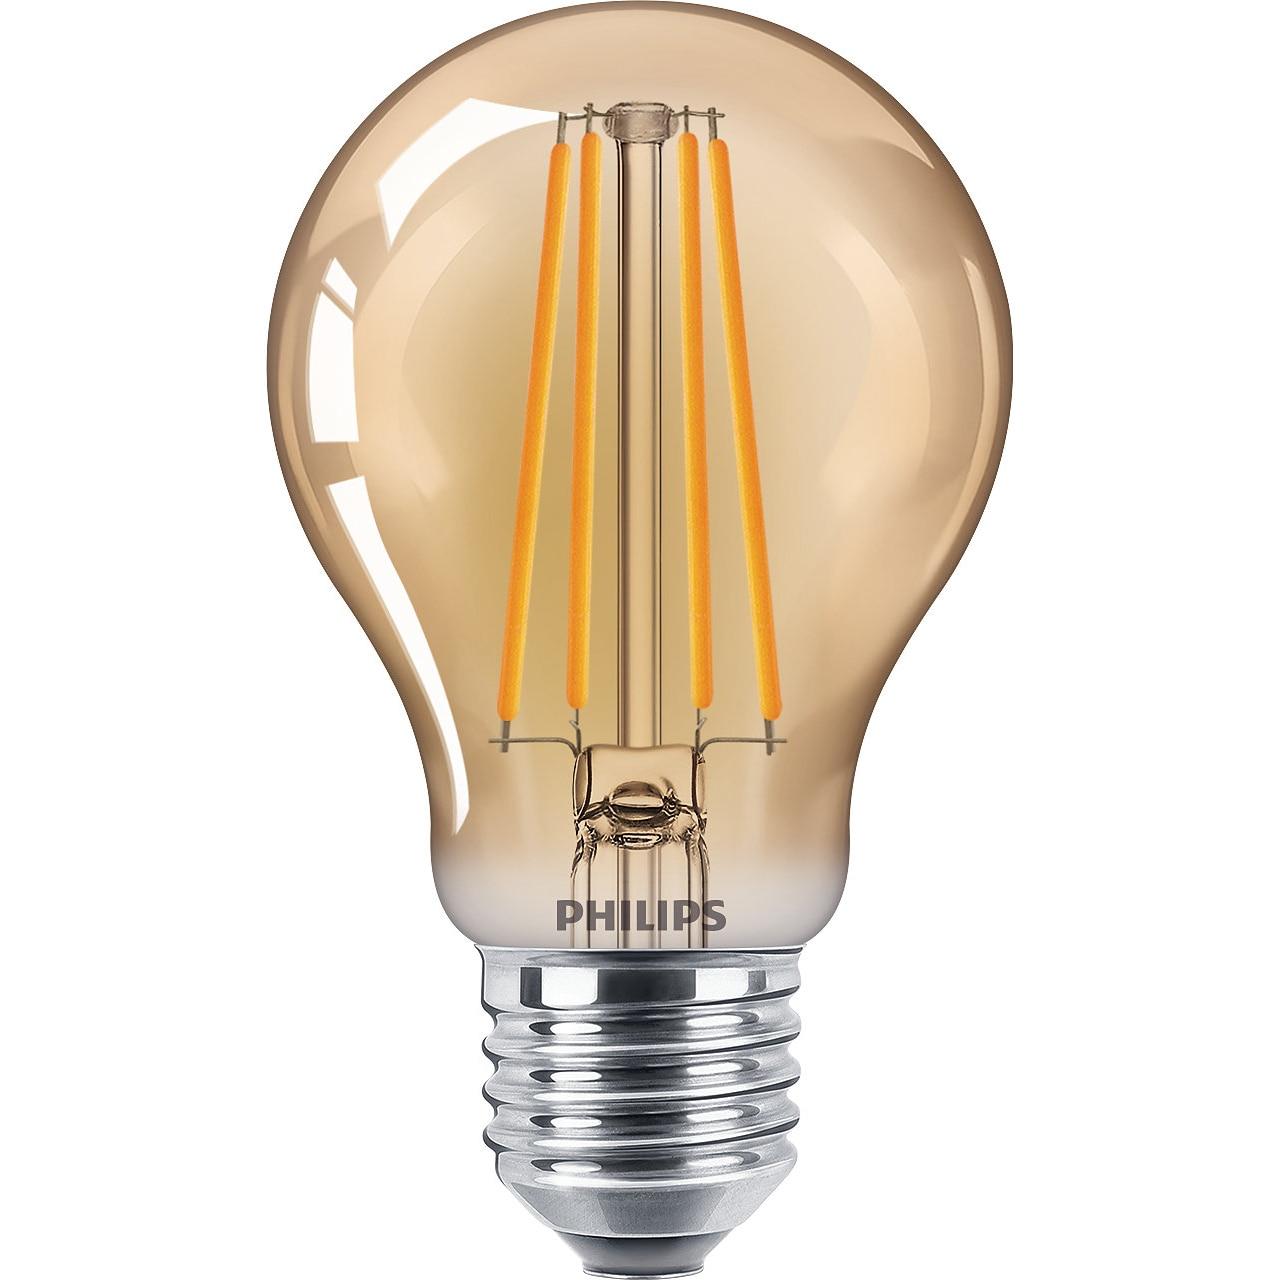 Fotografie Bec LED vintage Philips Classic, E27, 5.5W (48W), 600 lm, 2500K, flacara, Gold